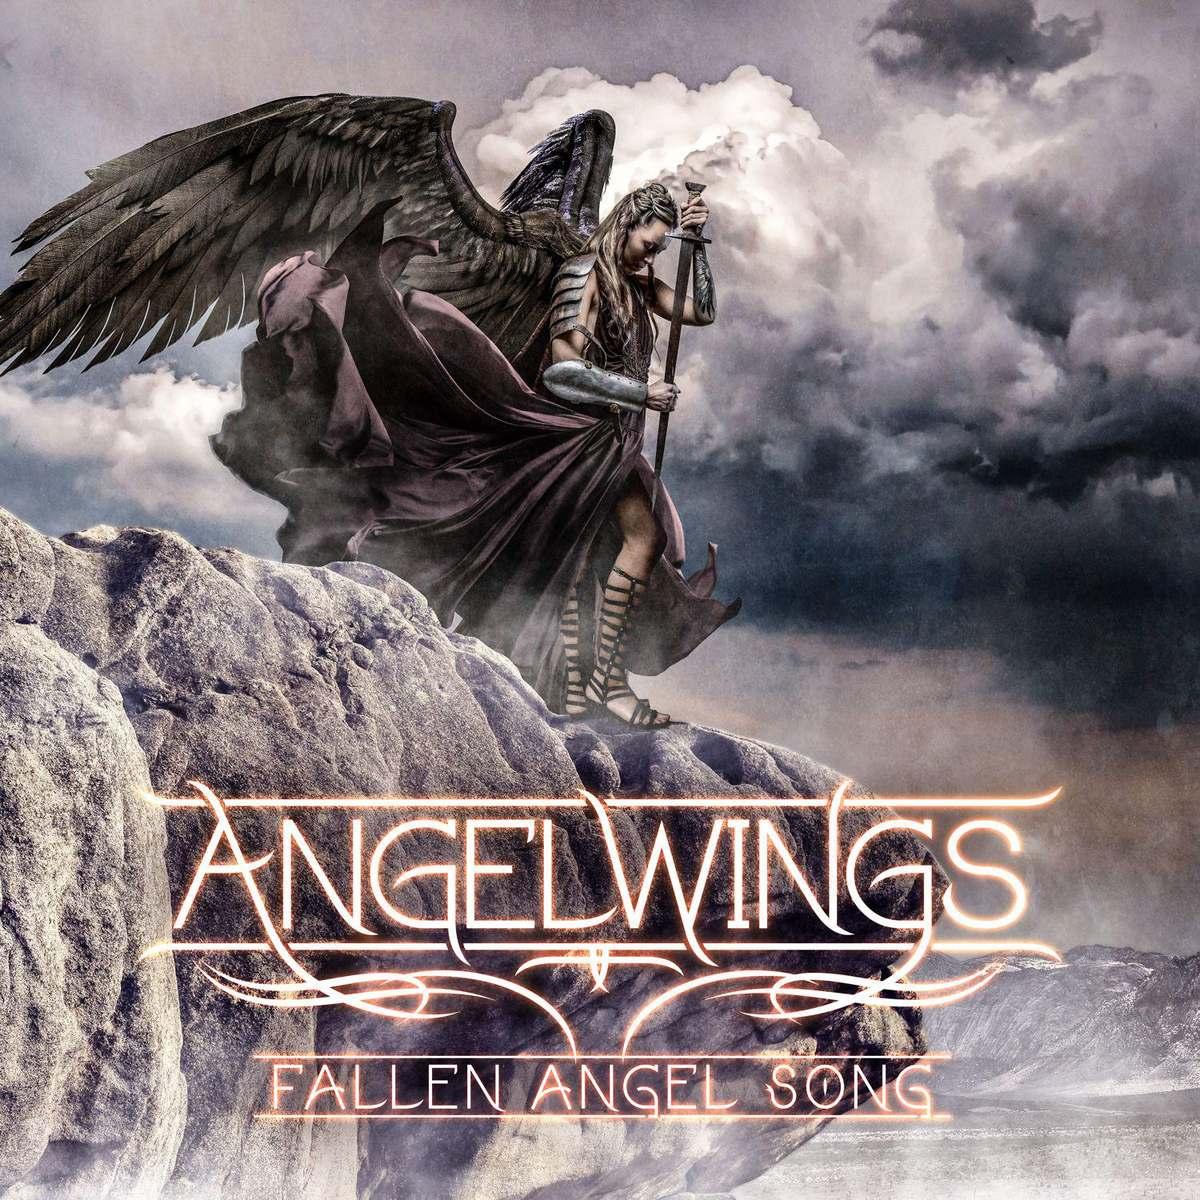 Angelwings - Fallen Angel Song